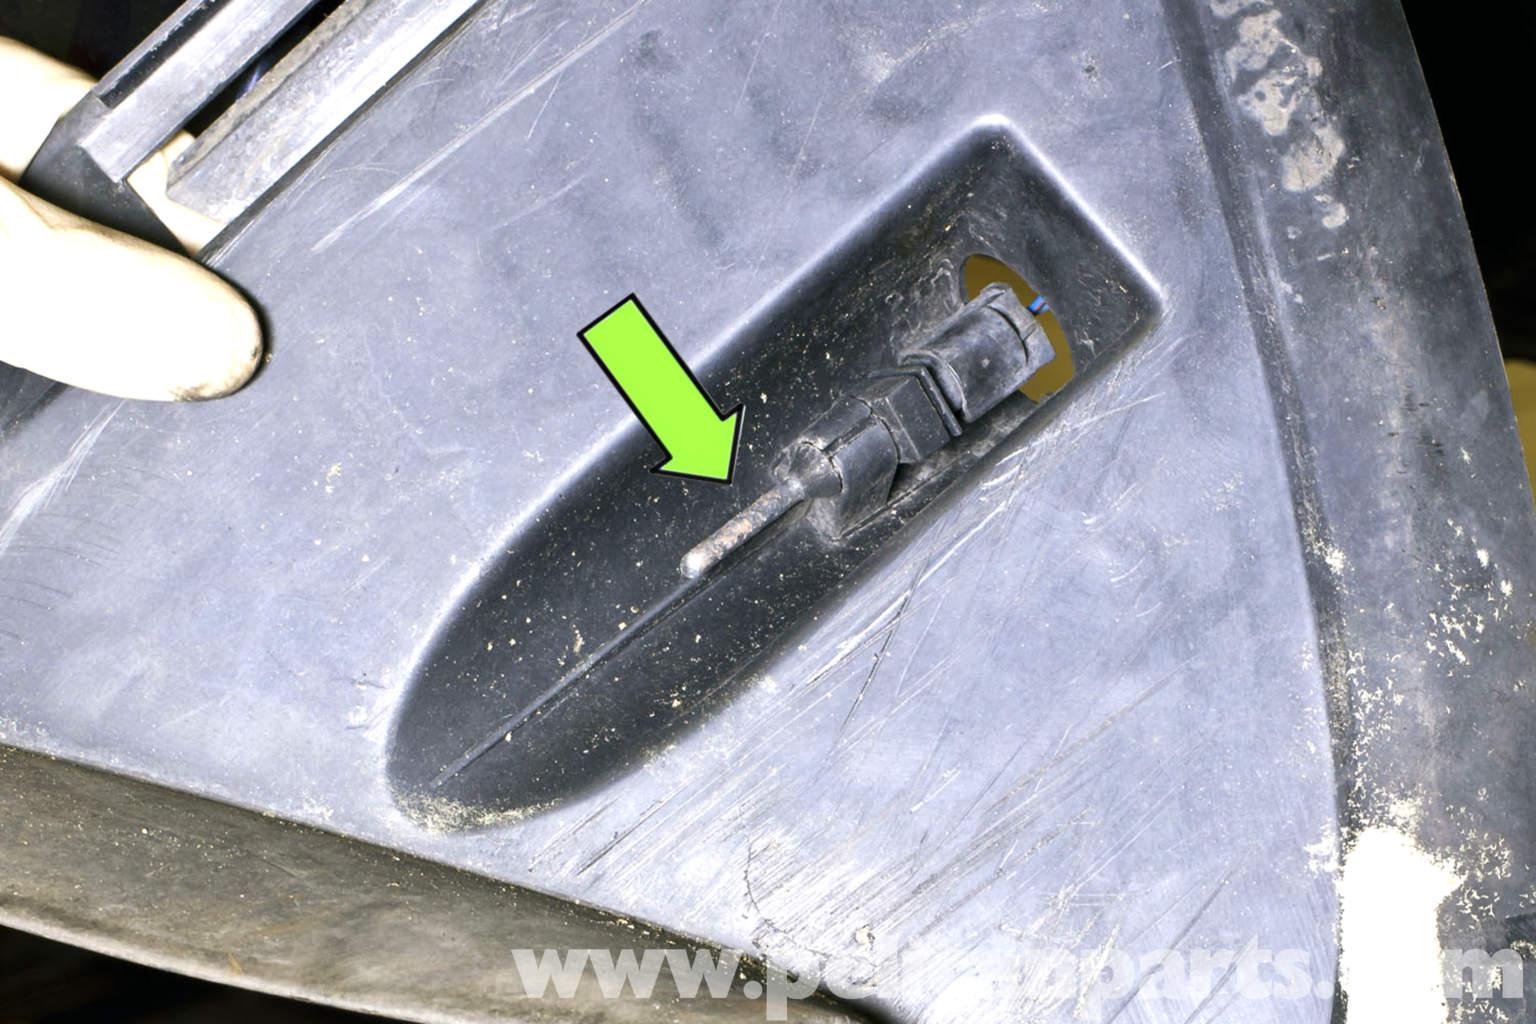 2006 Bmw 325xi >> BMW E46 Brake Duct Replacement| BMW 325i (2001-2005), BMW ...